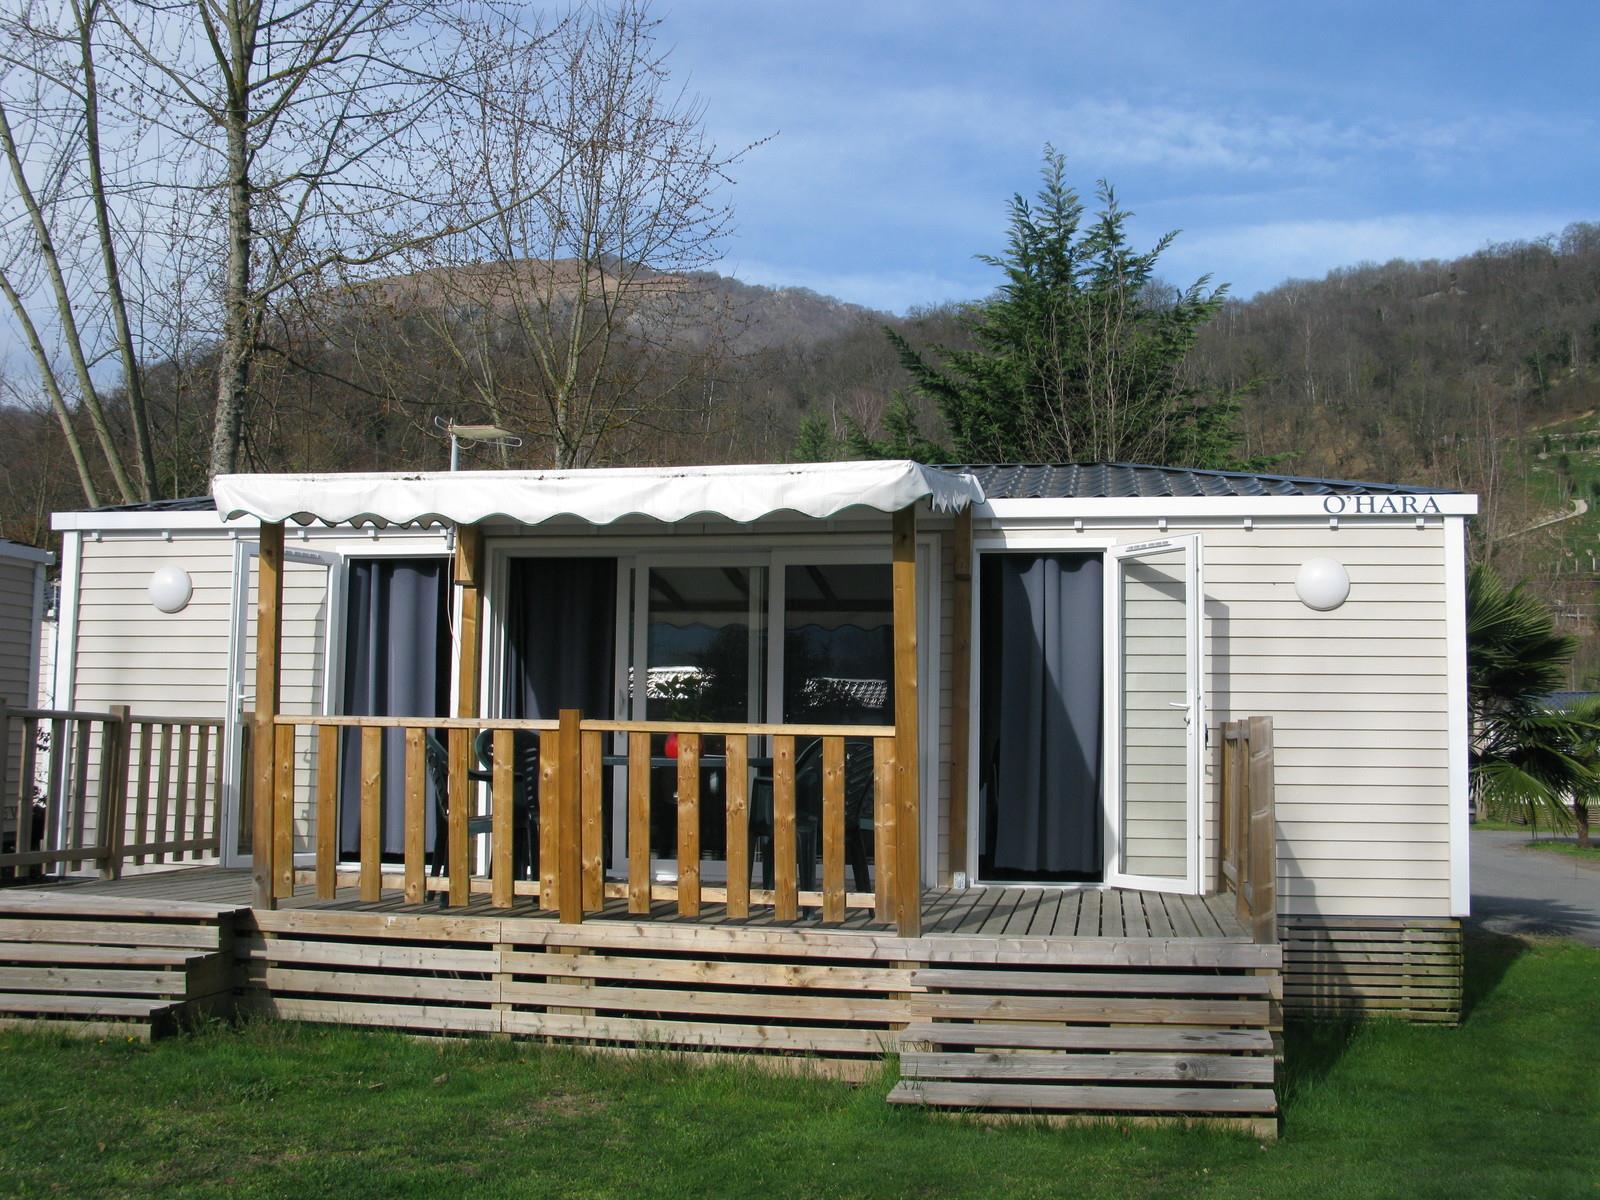 Location - Sunêlia Prestige Confort Plus 32M² (2 Chambres 2 Salles De Bain) - Sunêlia Camping Les 3 Vallées